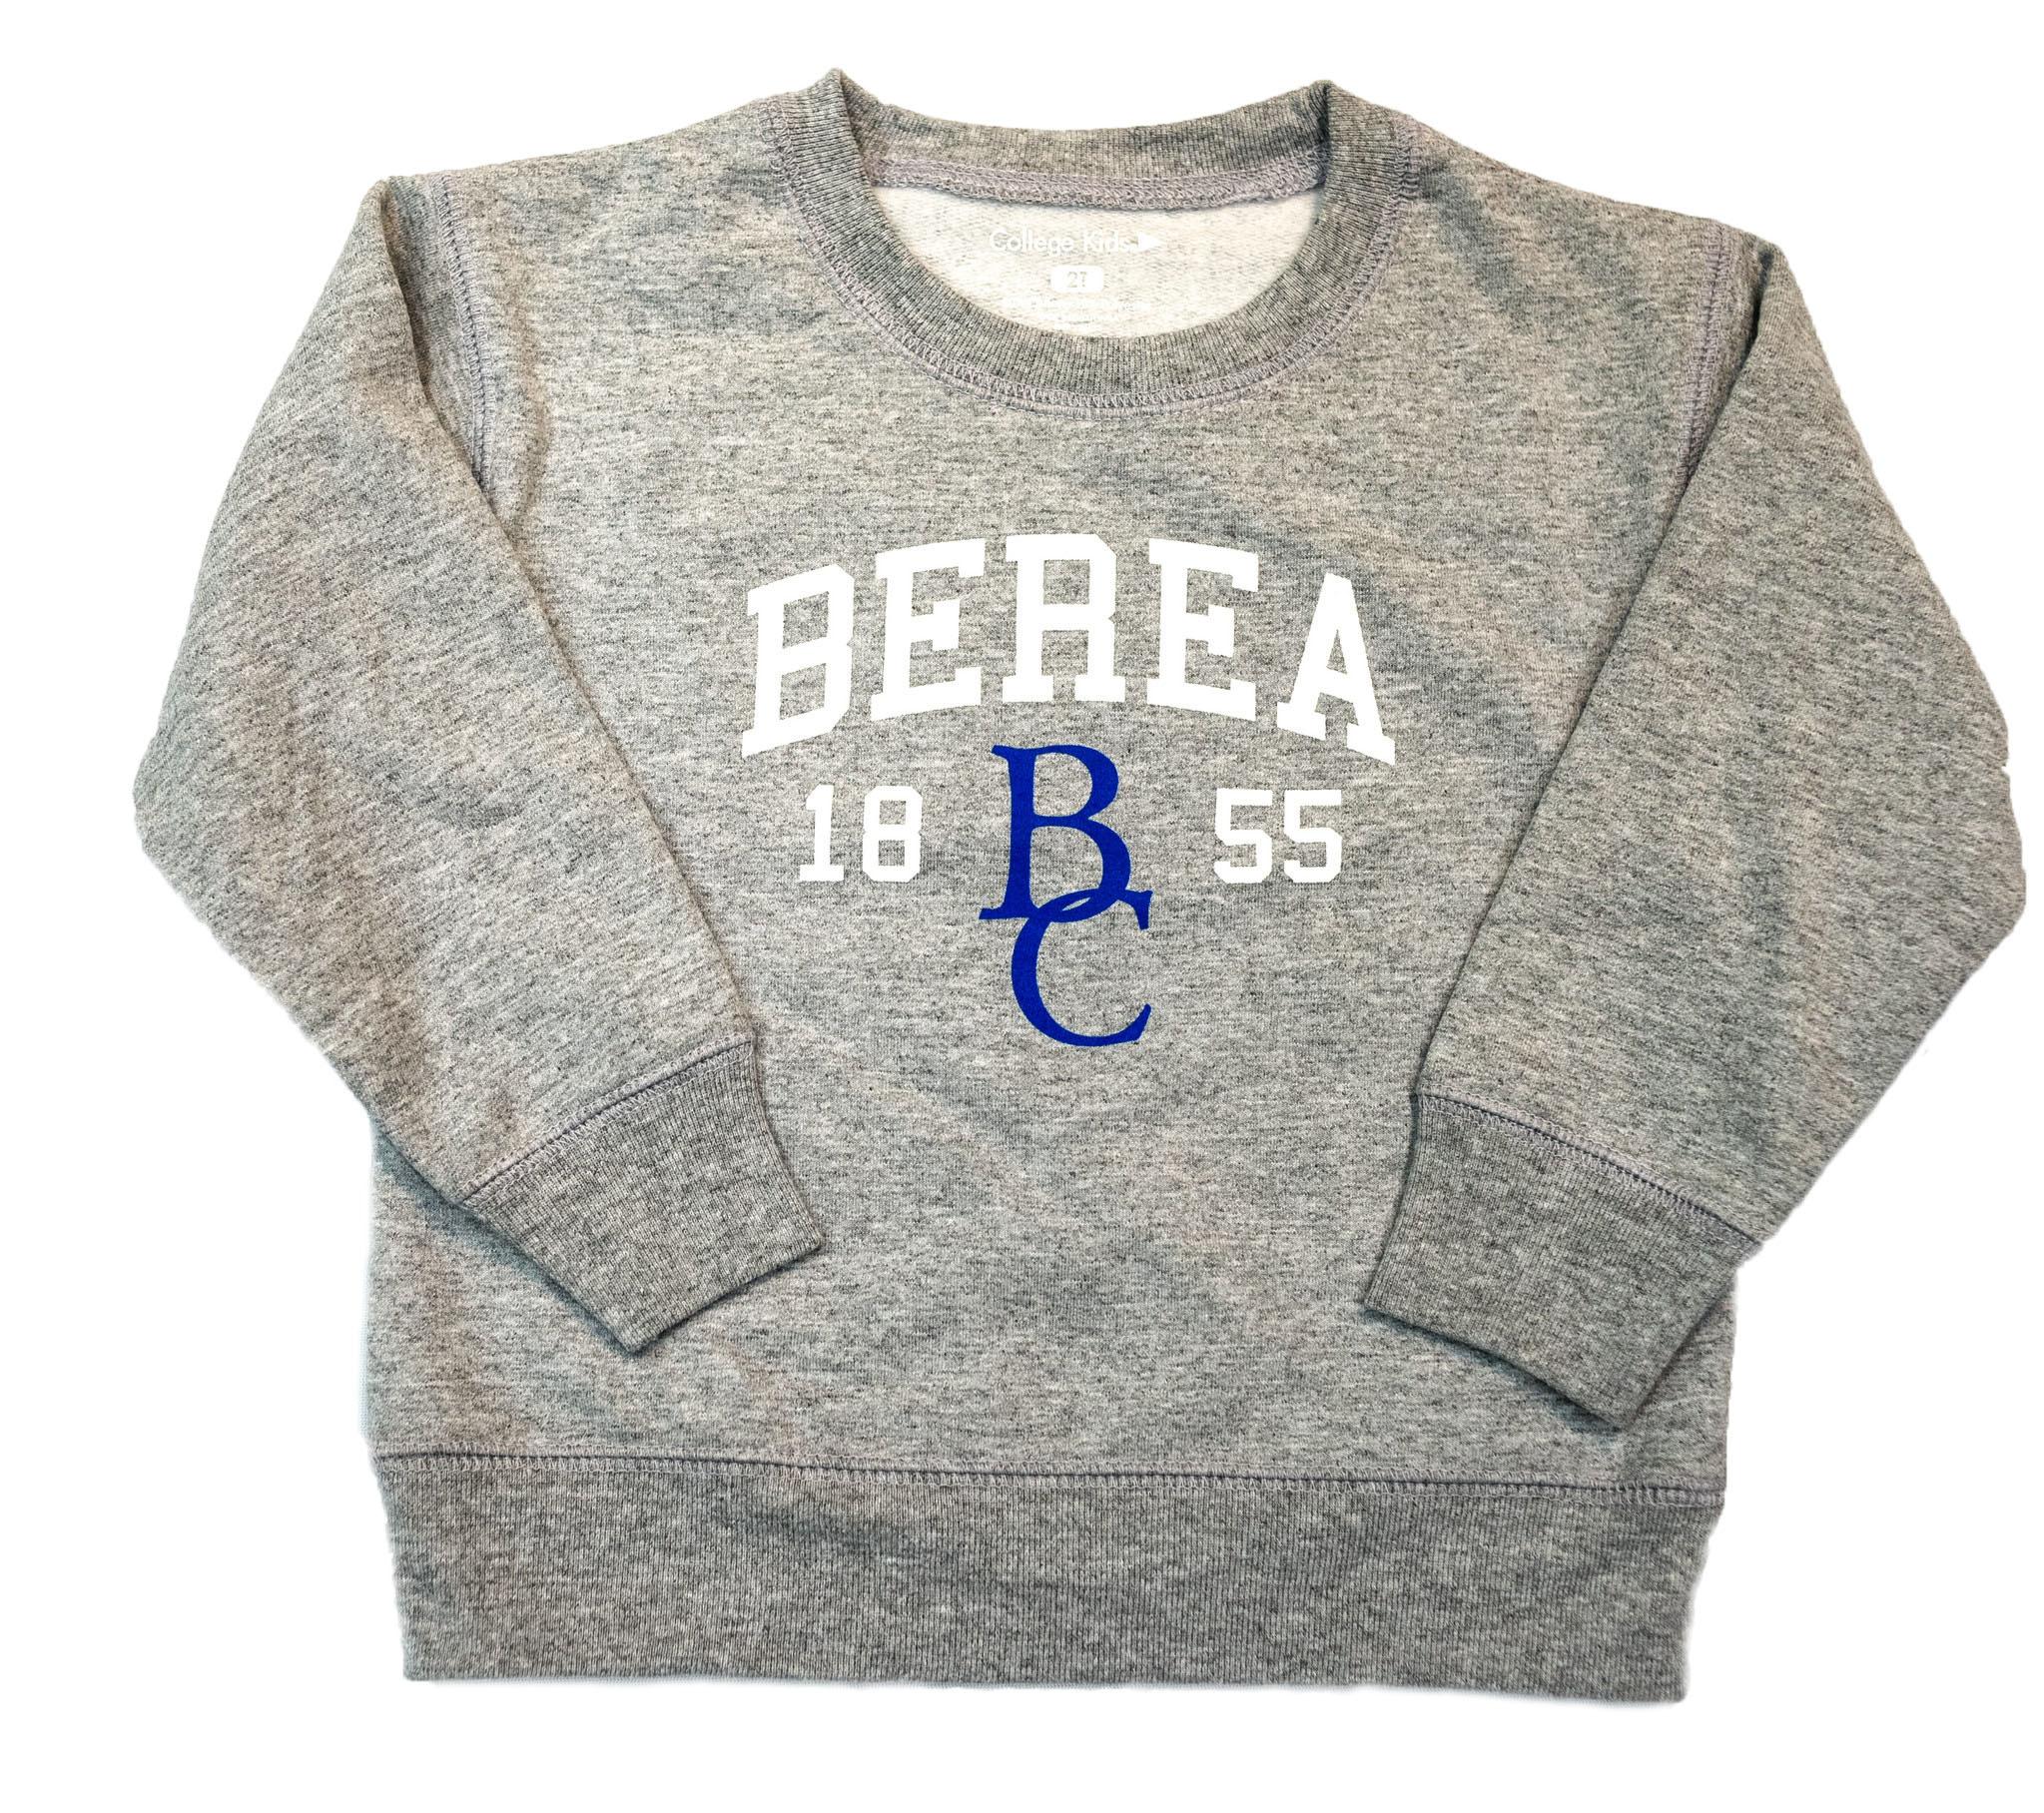 Pullover,Youth,Gray,Berea